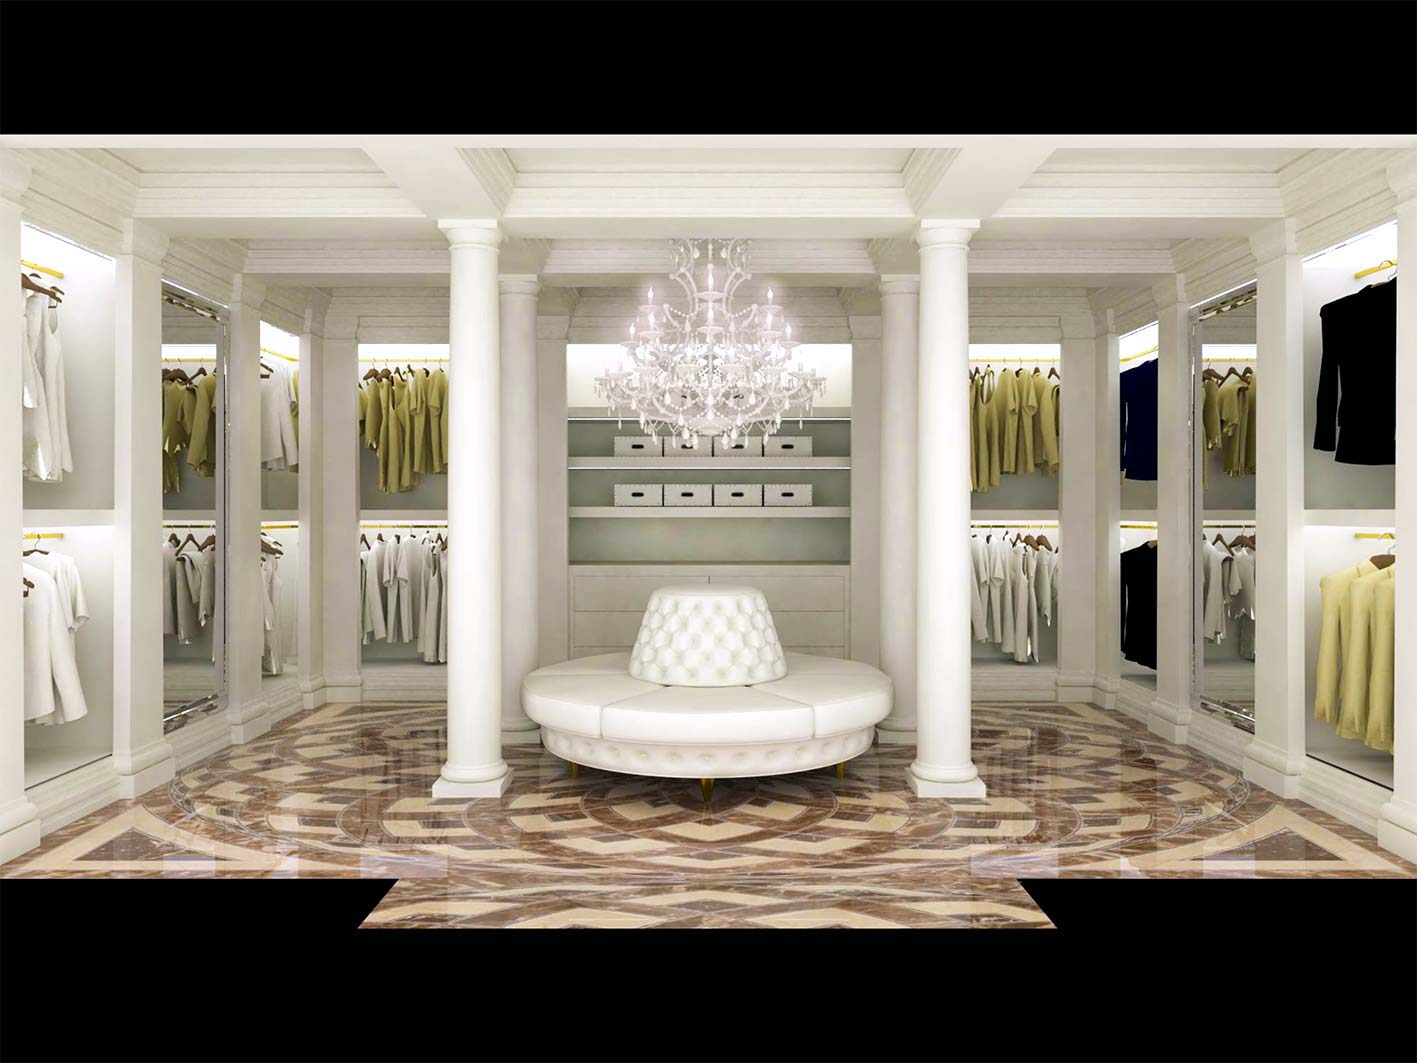 Cabine Armadio Luxury : Cabine armadio ozonizzate nuovo stile design